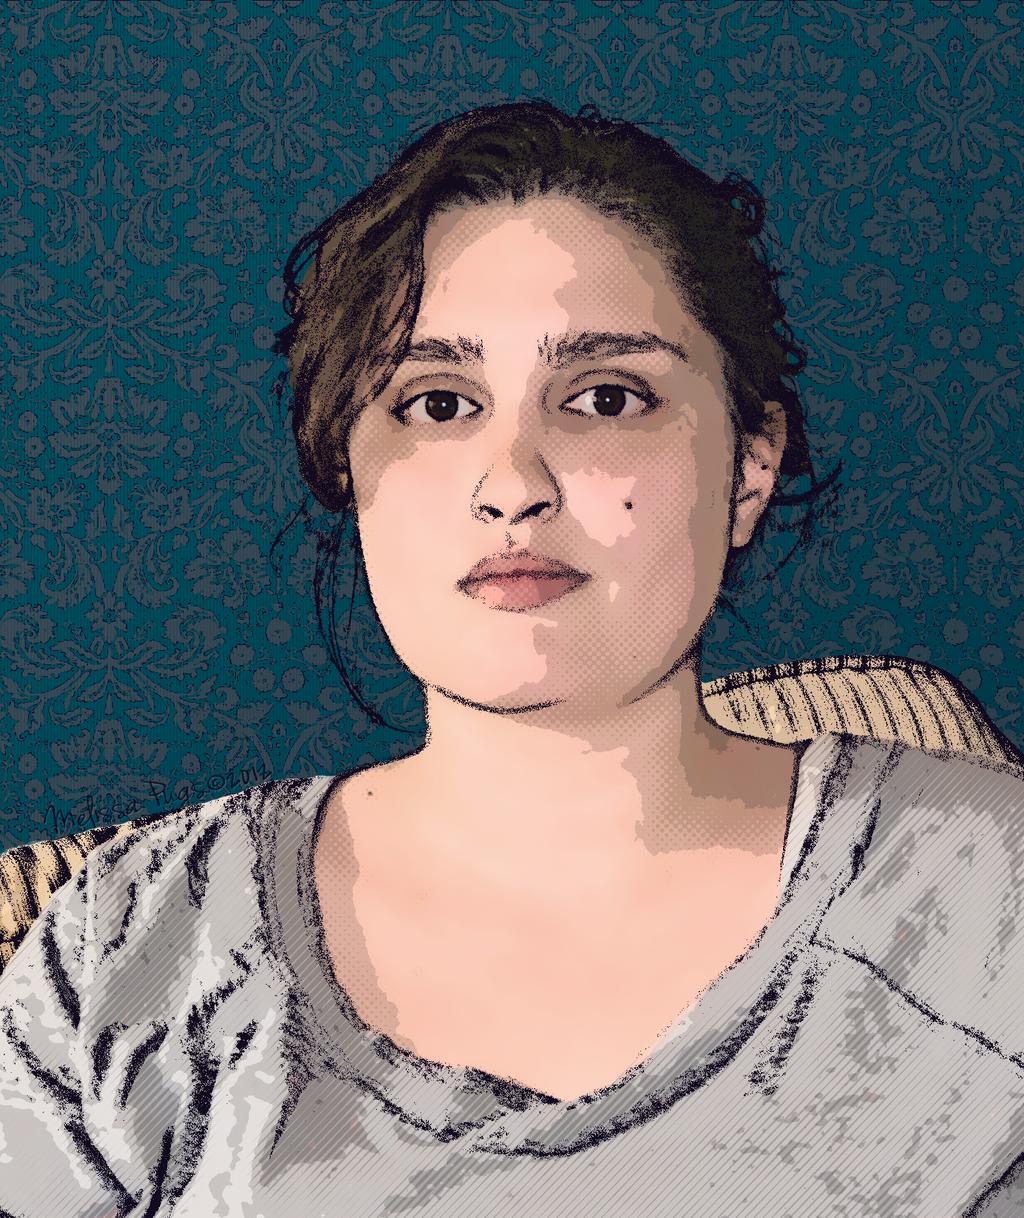 melissapugs's Profile Picture